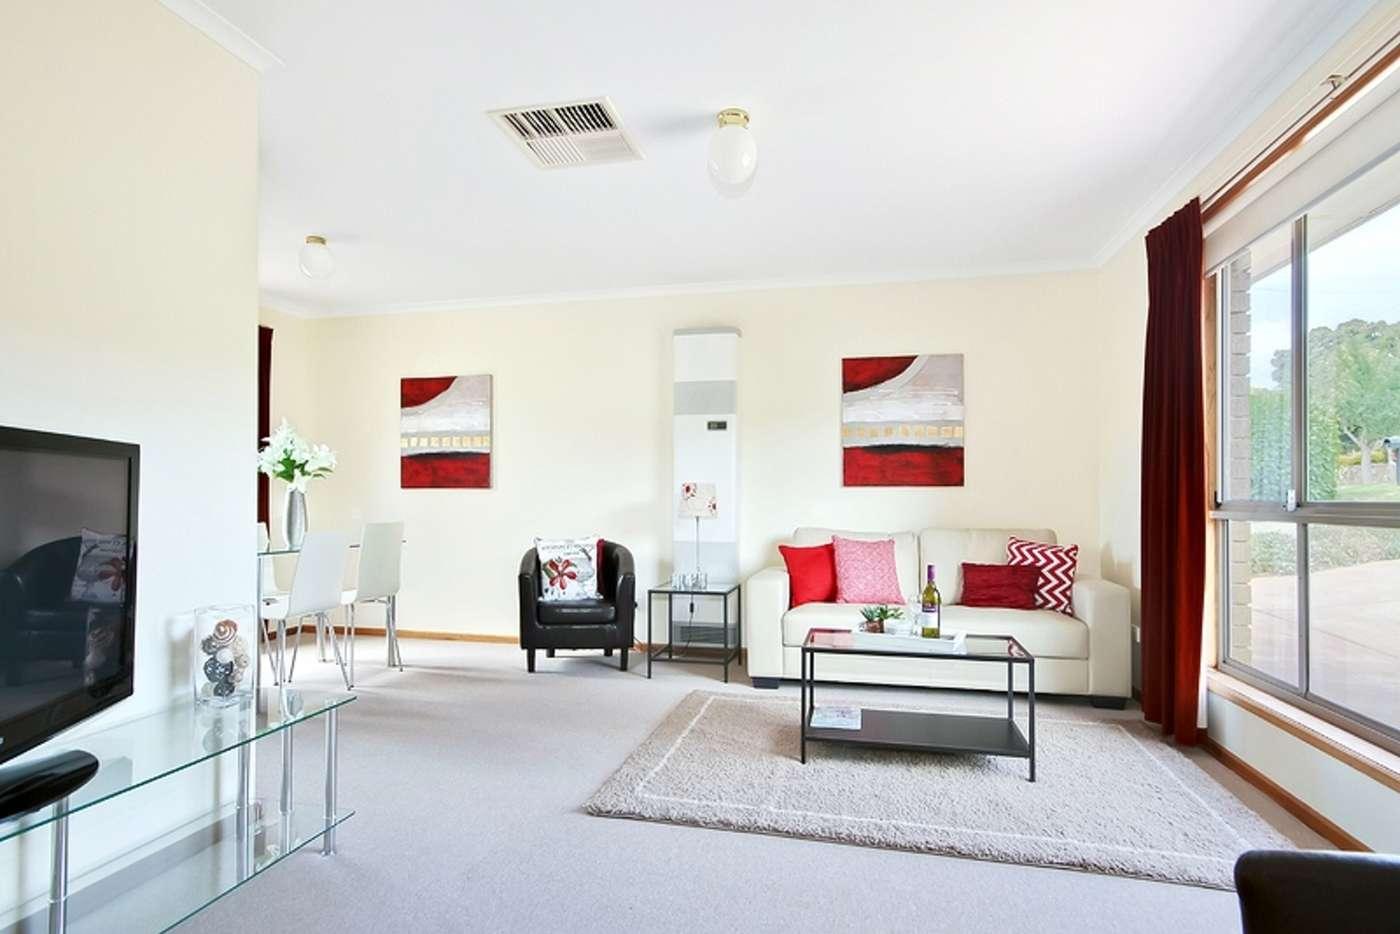 Main view of Homely house listing, 28 Saphire Road, Morphett Vale SA 5162